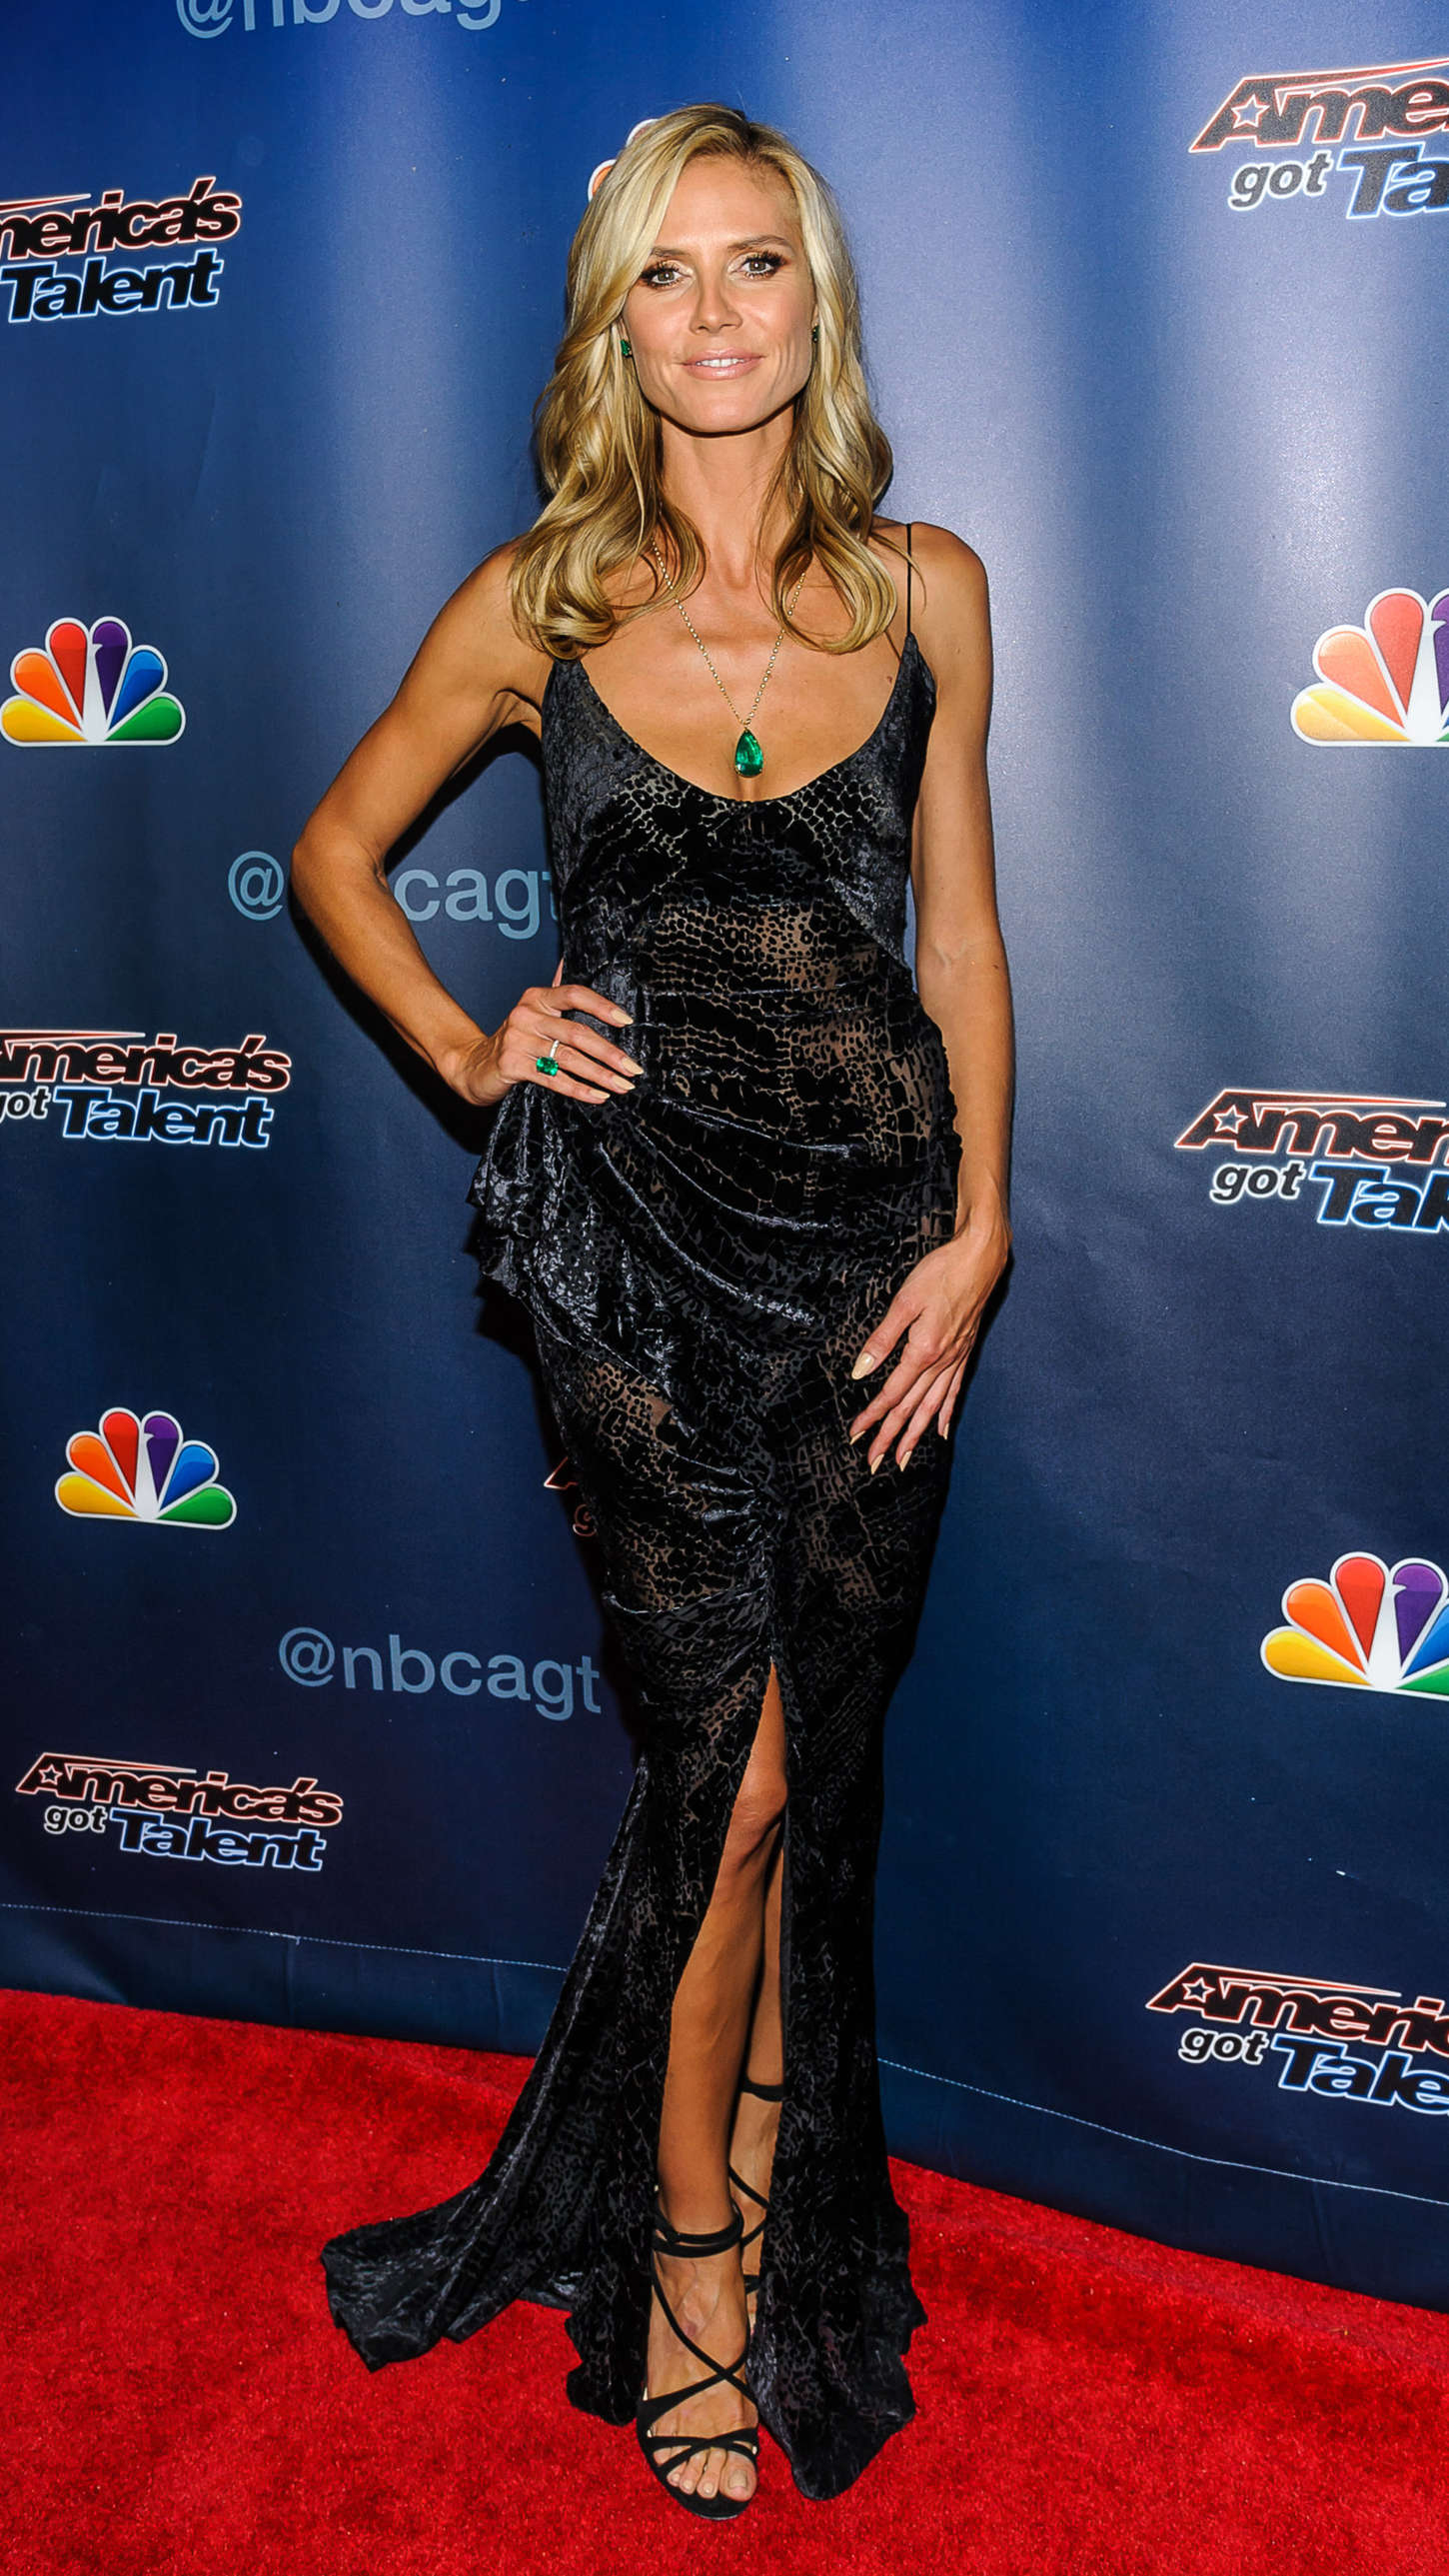 Heidi Klum Americas Got Talent Season 9 Finale Event 10